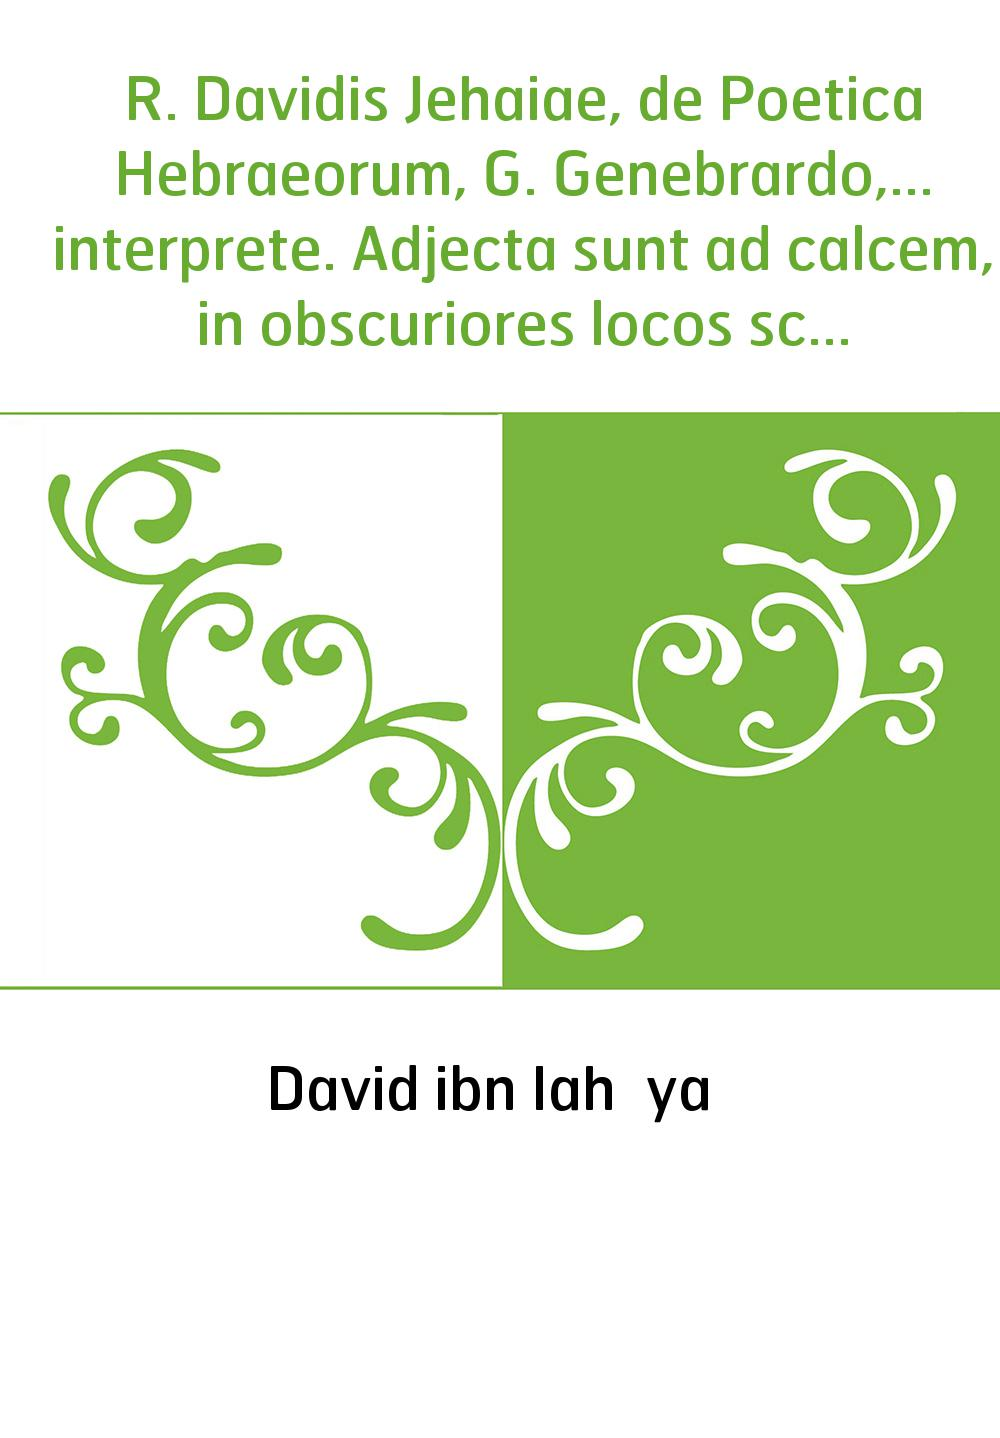 R. Davidis Jehaiae, de Poetica Hebraeorum, G. Genebrardo,... interprete. Adjecta sunt ad calcem, in obscuriores locos scholia, e